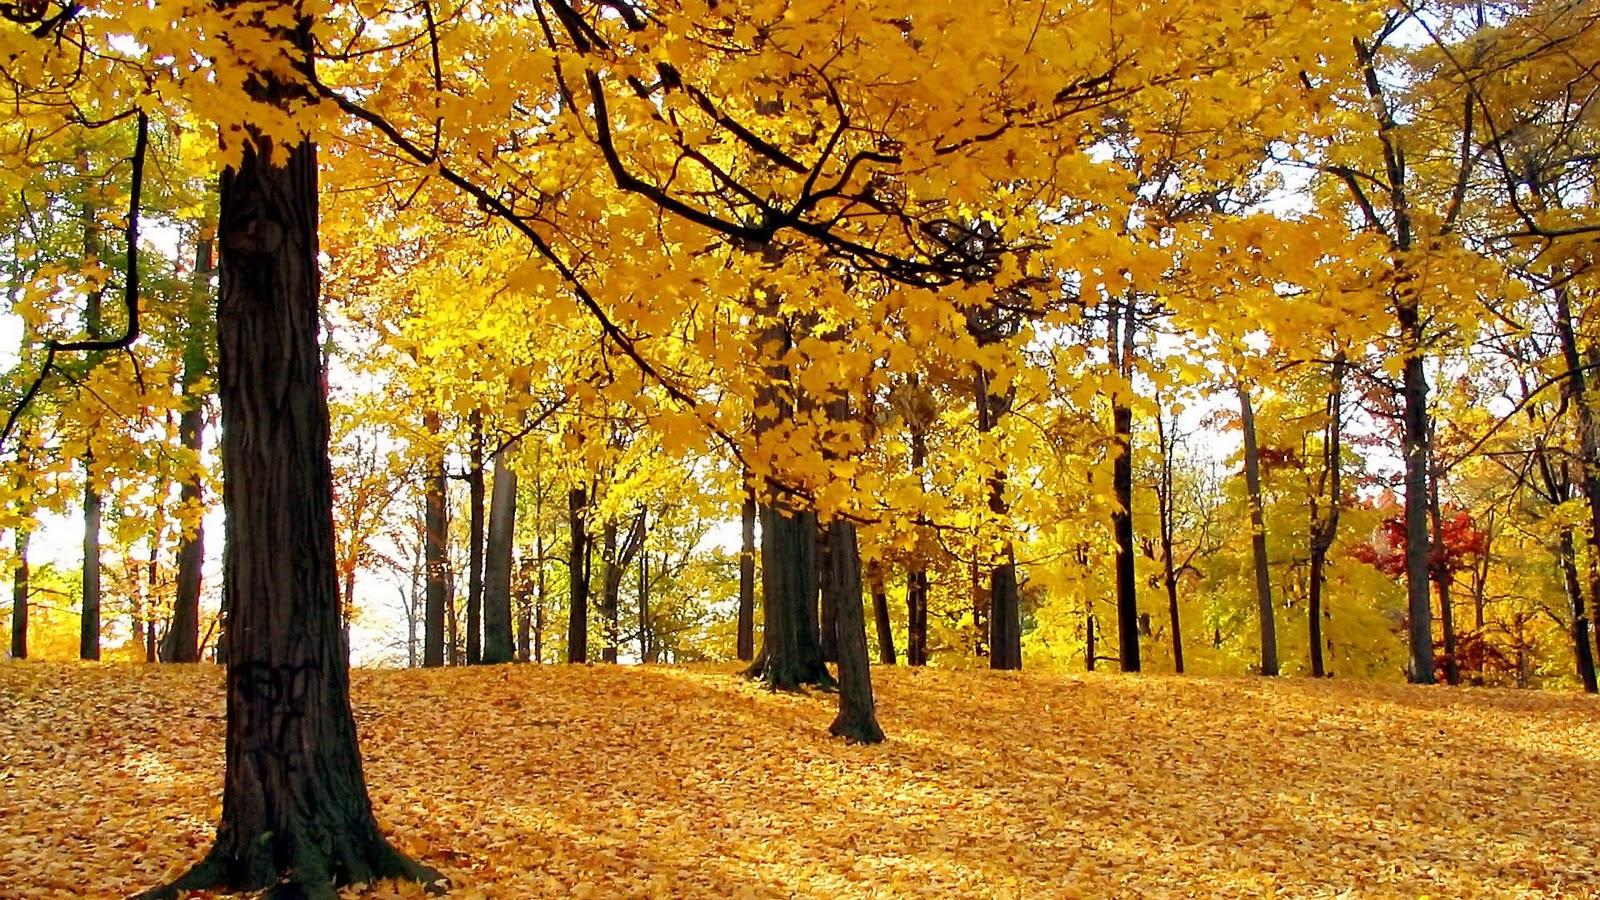 The best top autumn desktop wallpapers 27 En Güzel Sonbahar HD Duvar Kağıtları